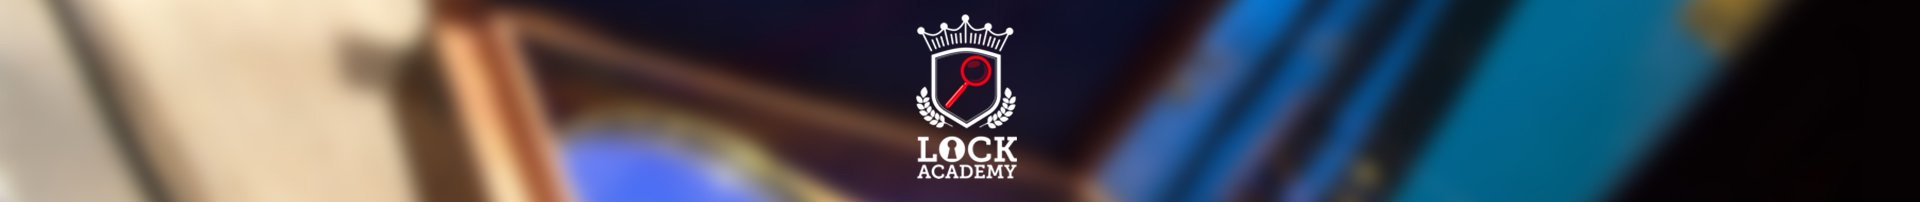 casse du siècle lock academy.jpg